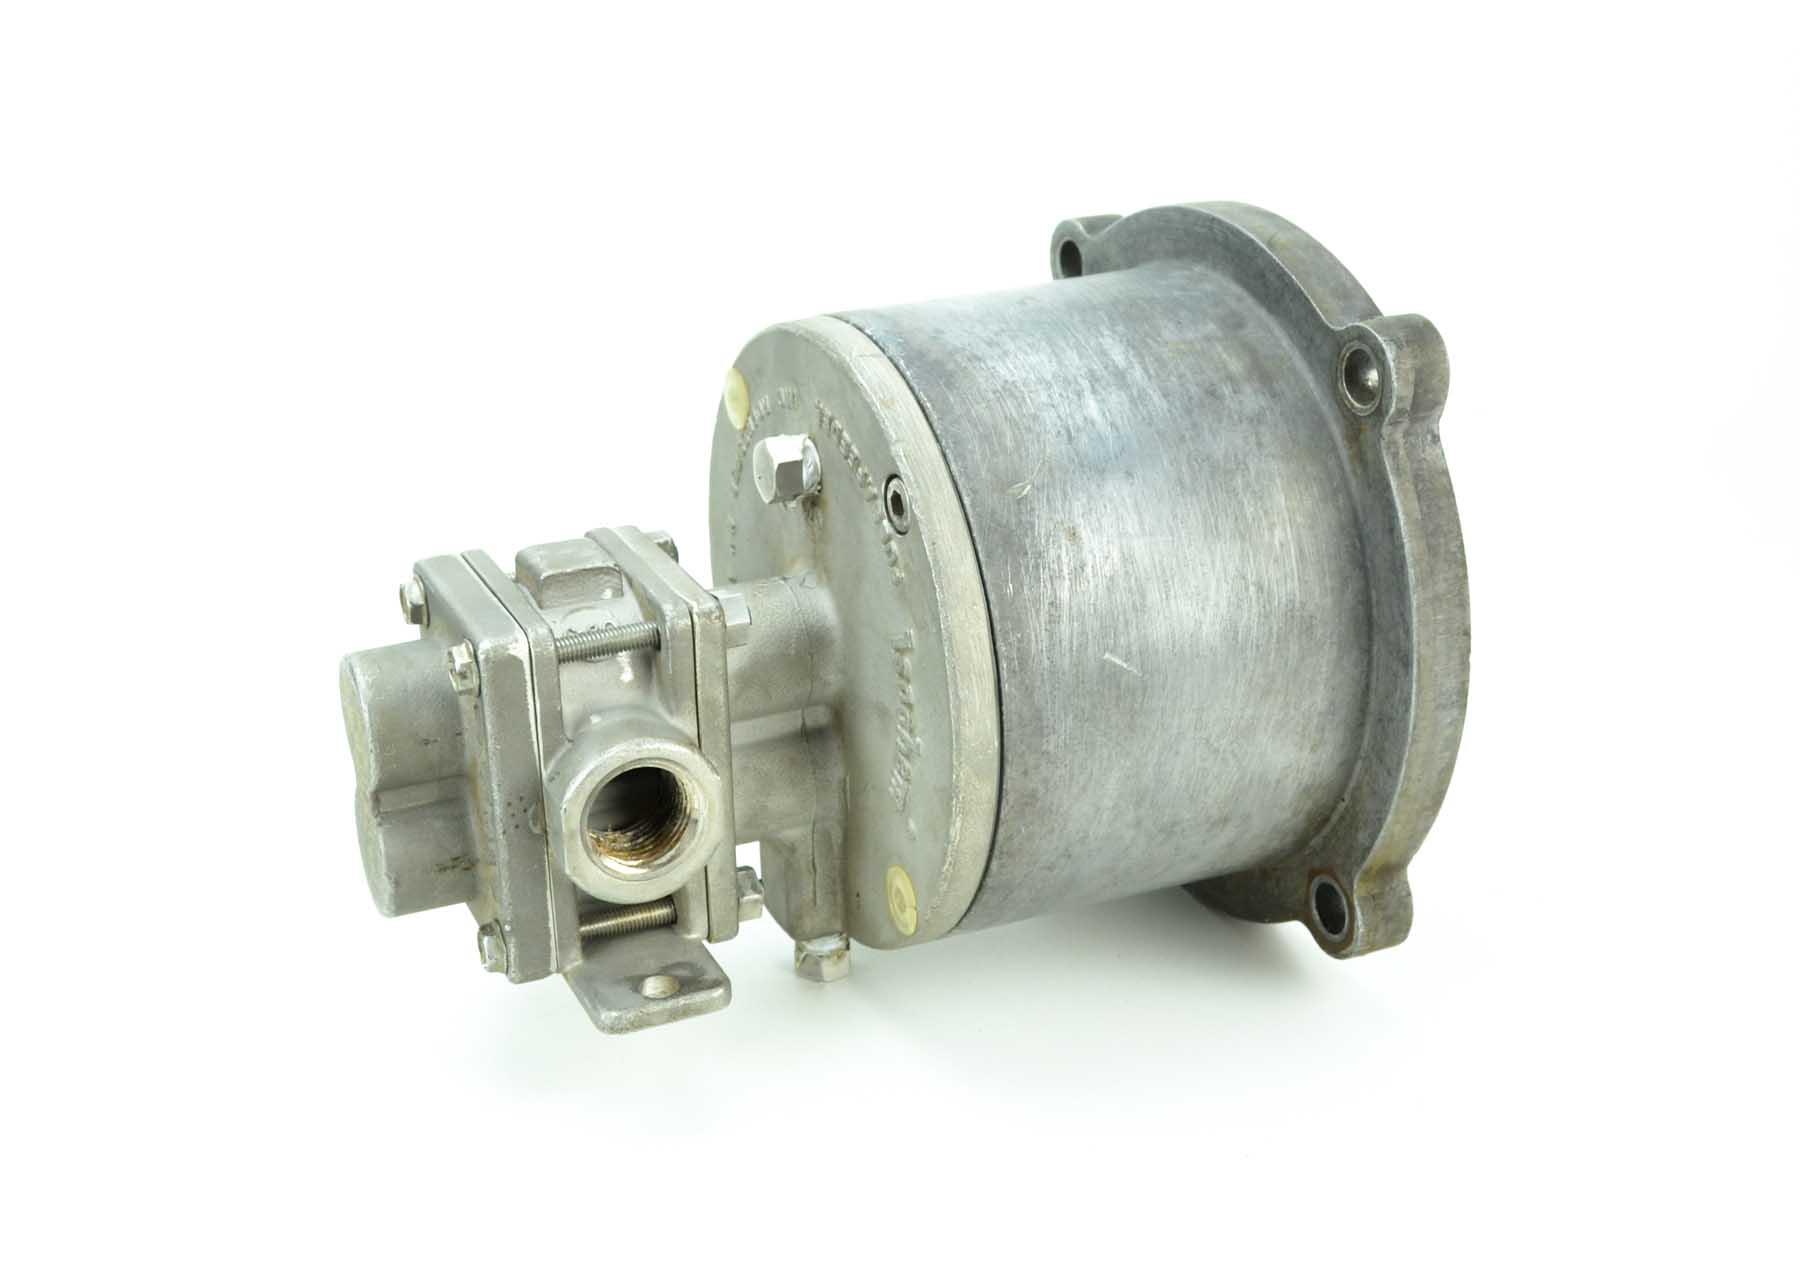 Liquiflo Aftermarket Pulsafeeder ECO GMC4 Stainless Pump